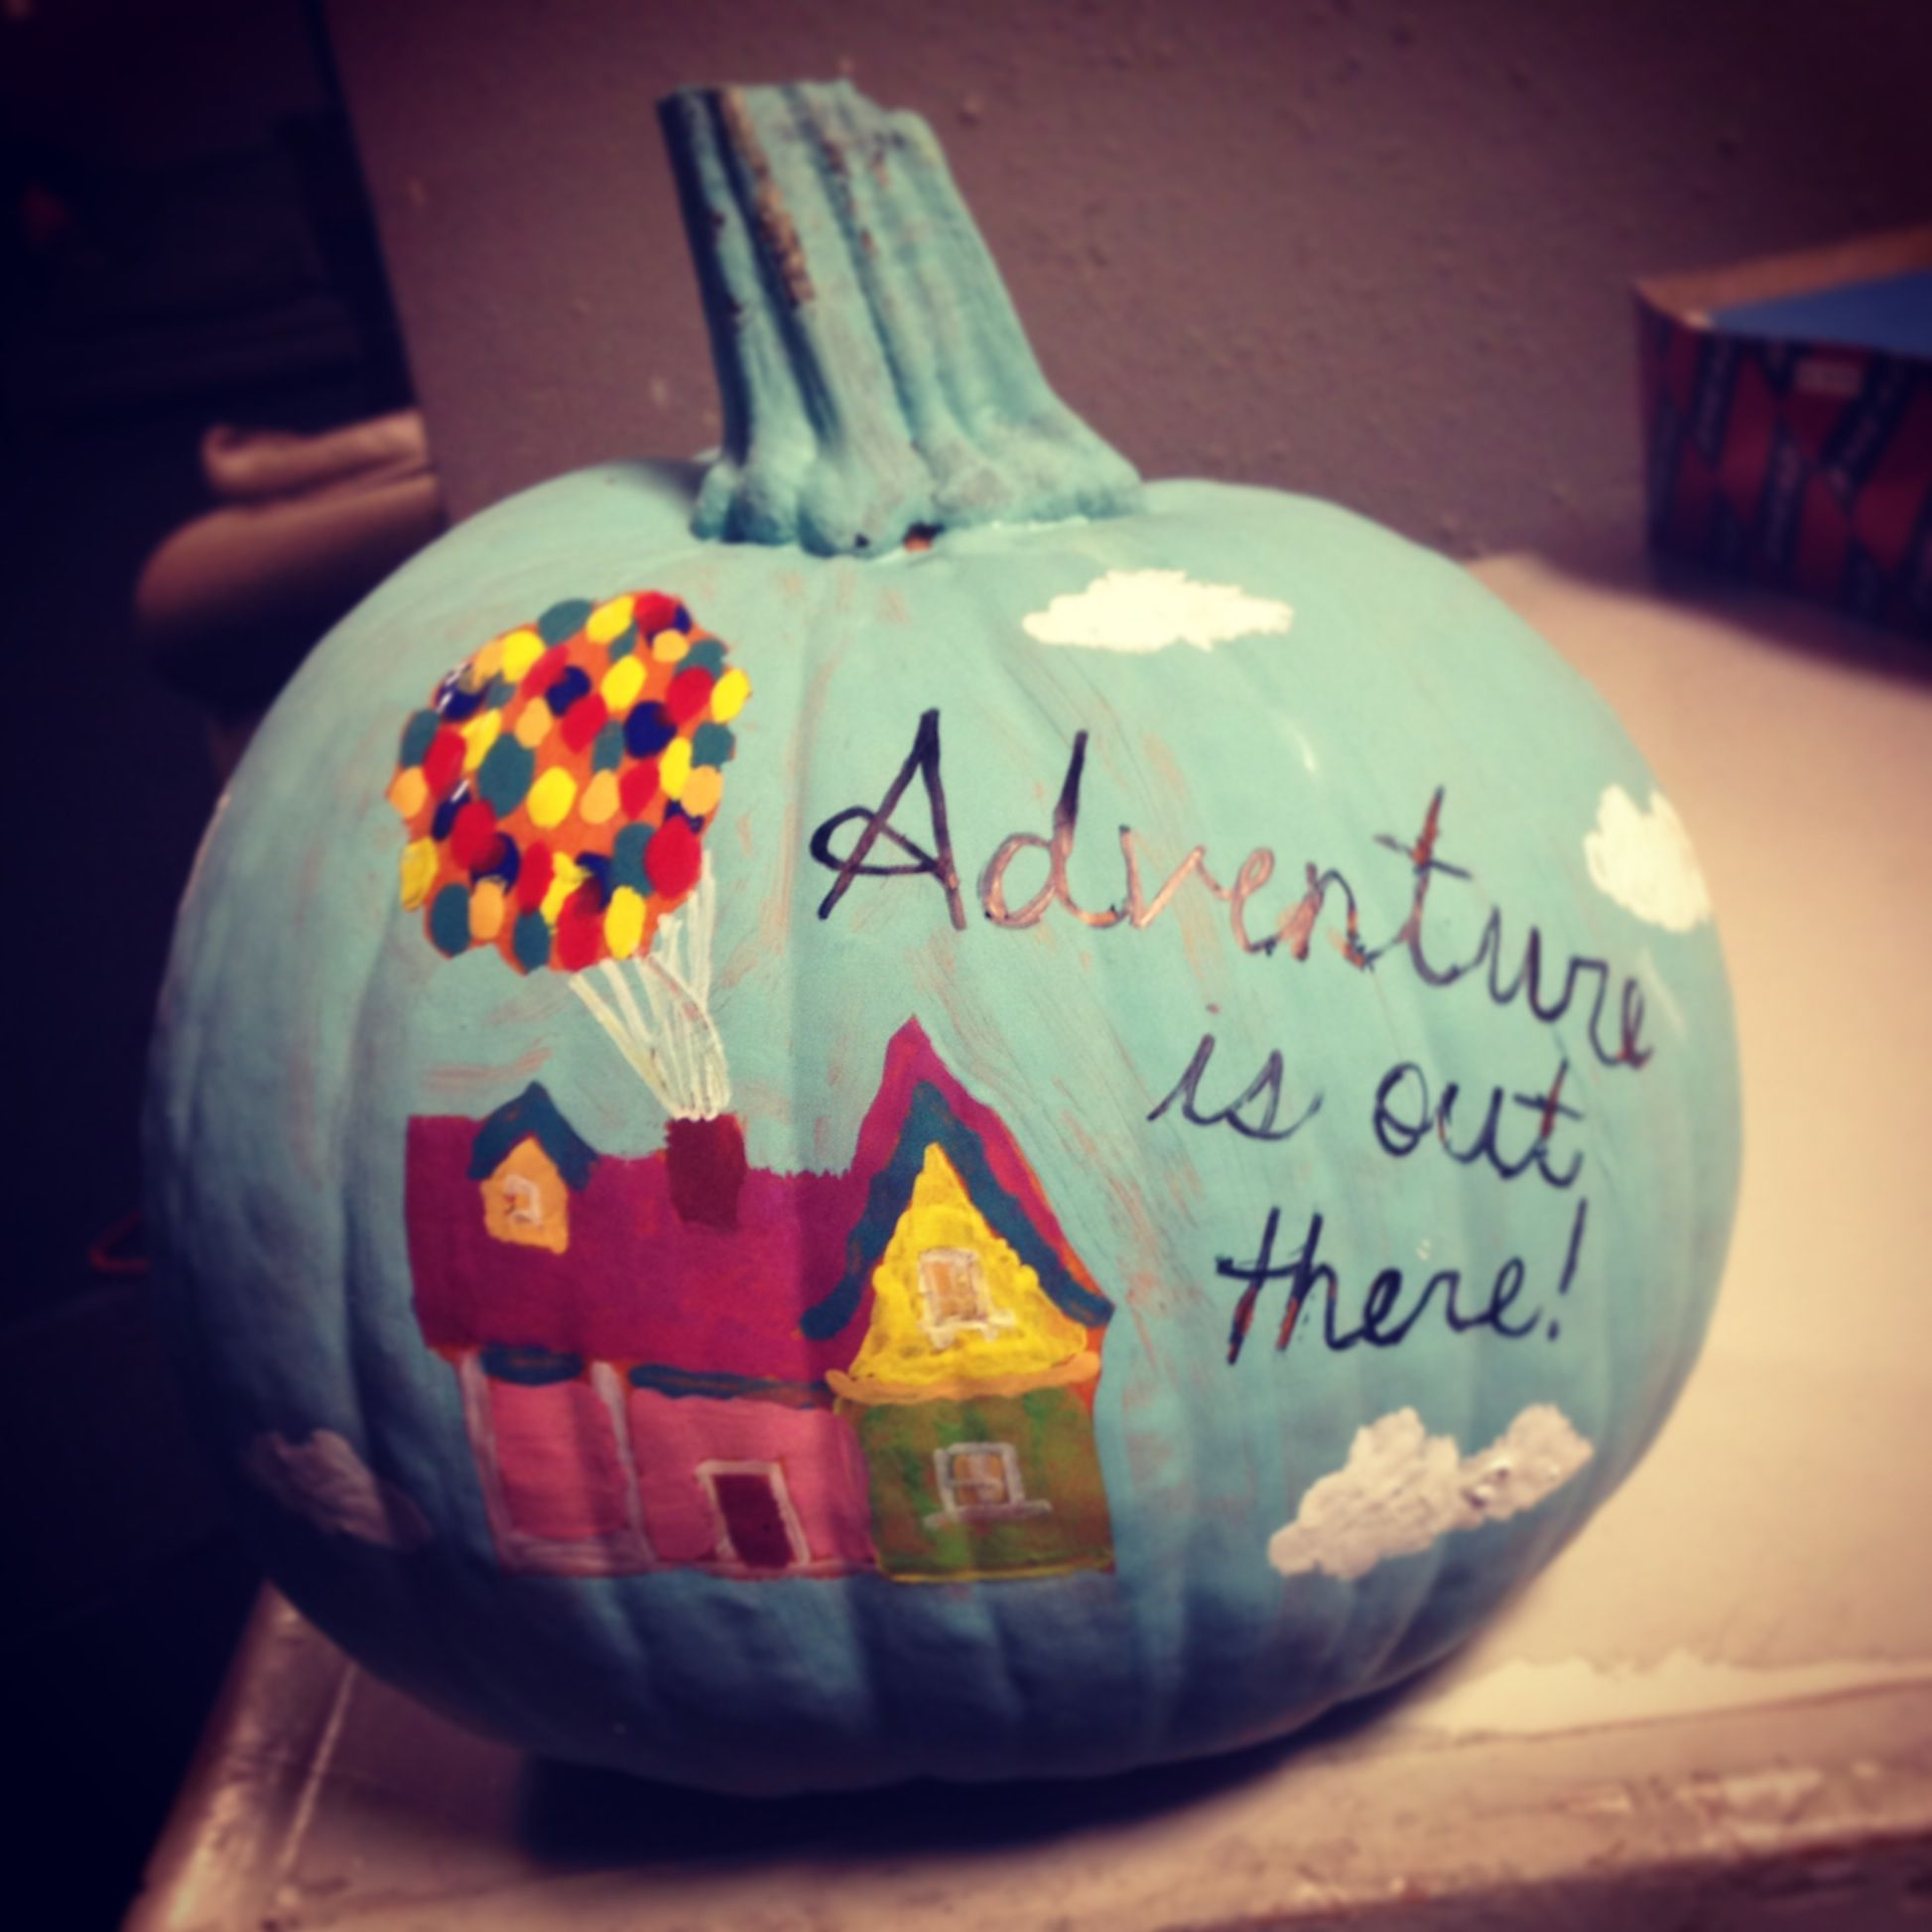 15 Easy Pumpkin Painting Ideas That Look Cute 2021 Edition Disney Pumpkin Painted Pumpkins Disney Pumpkin Painting